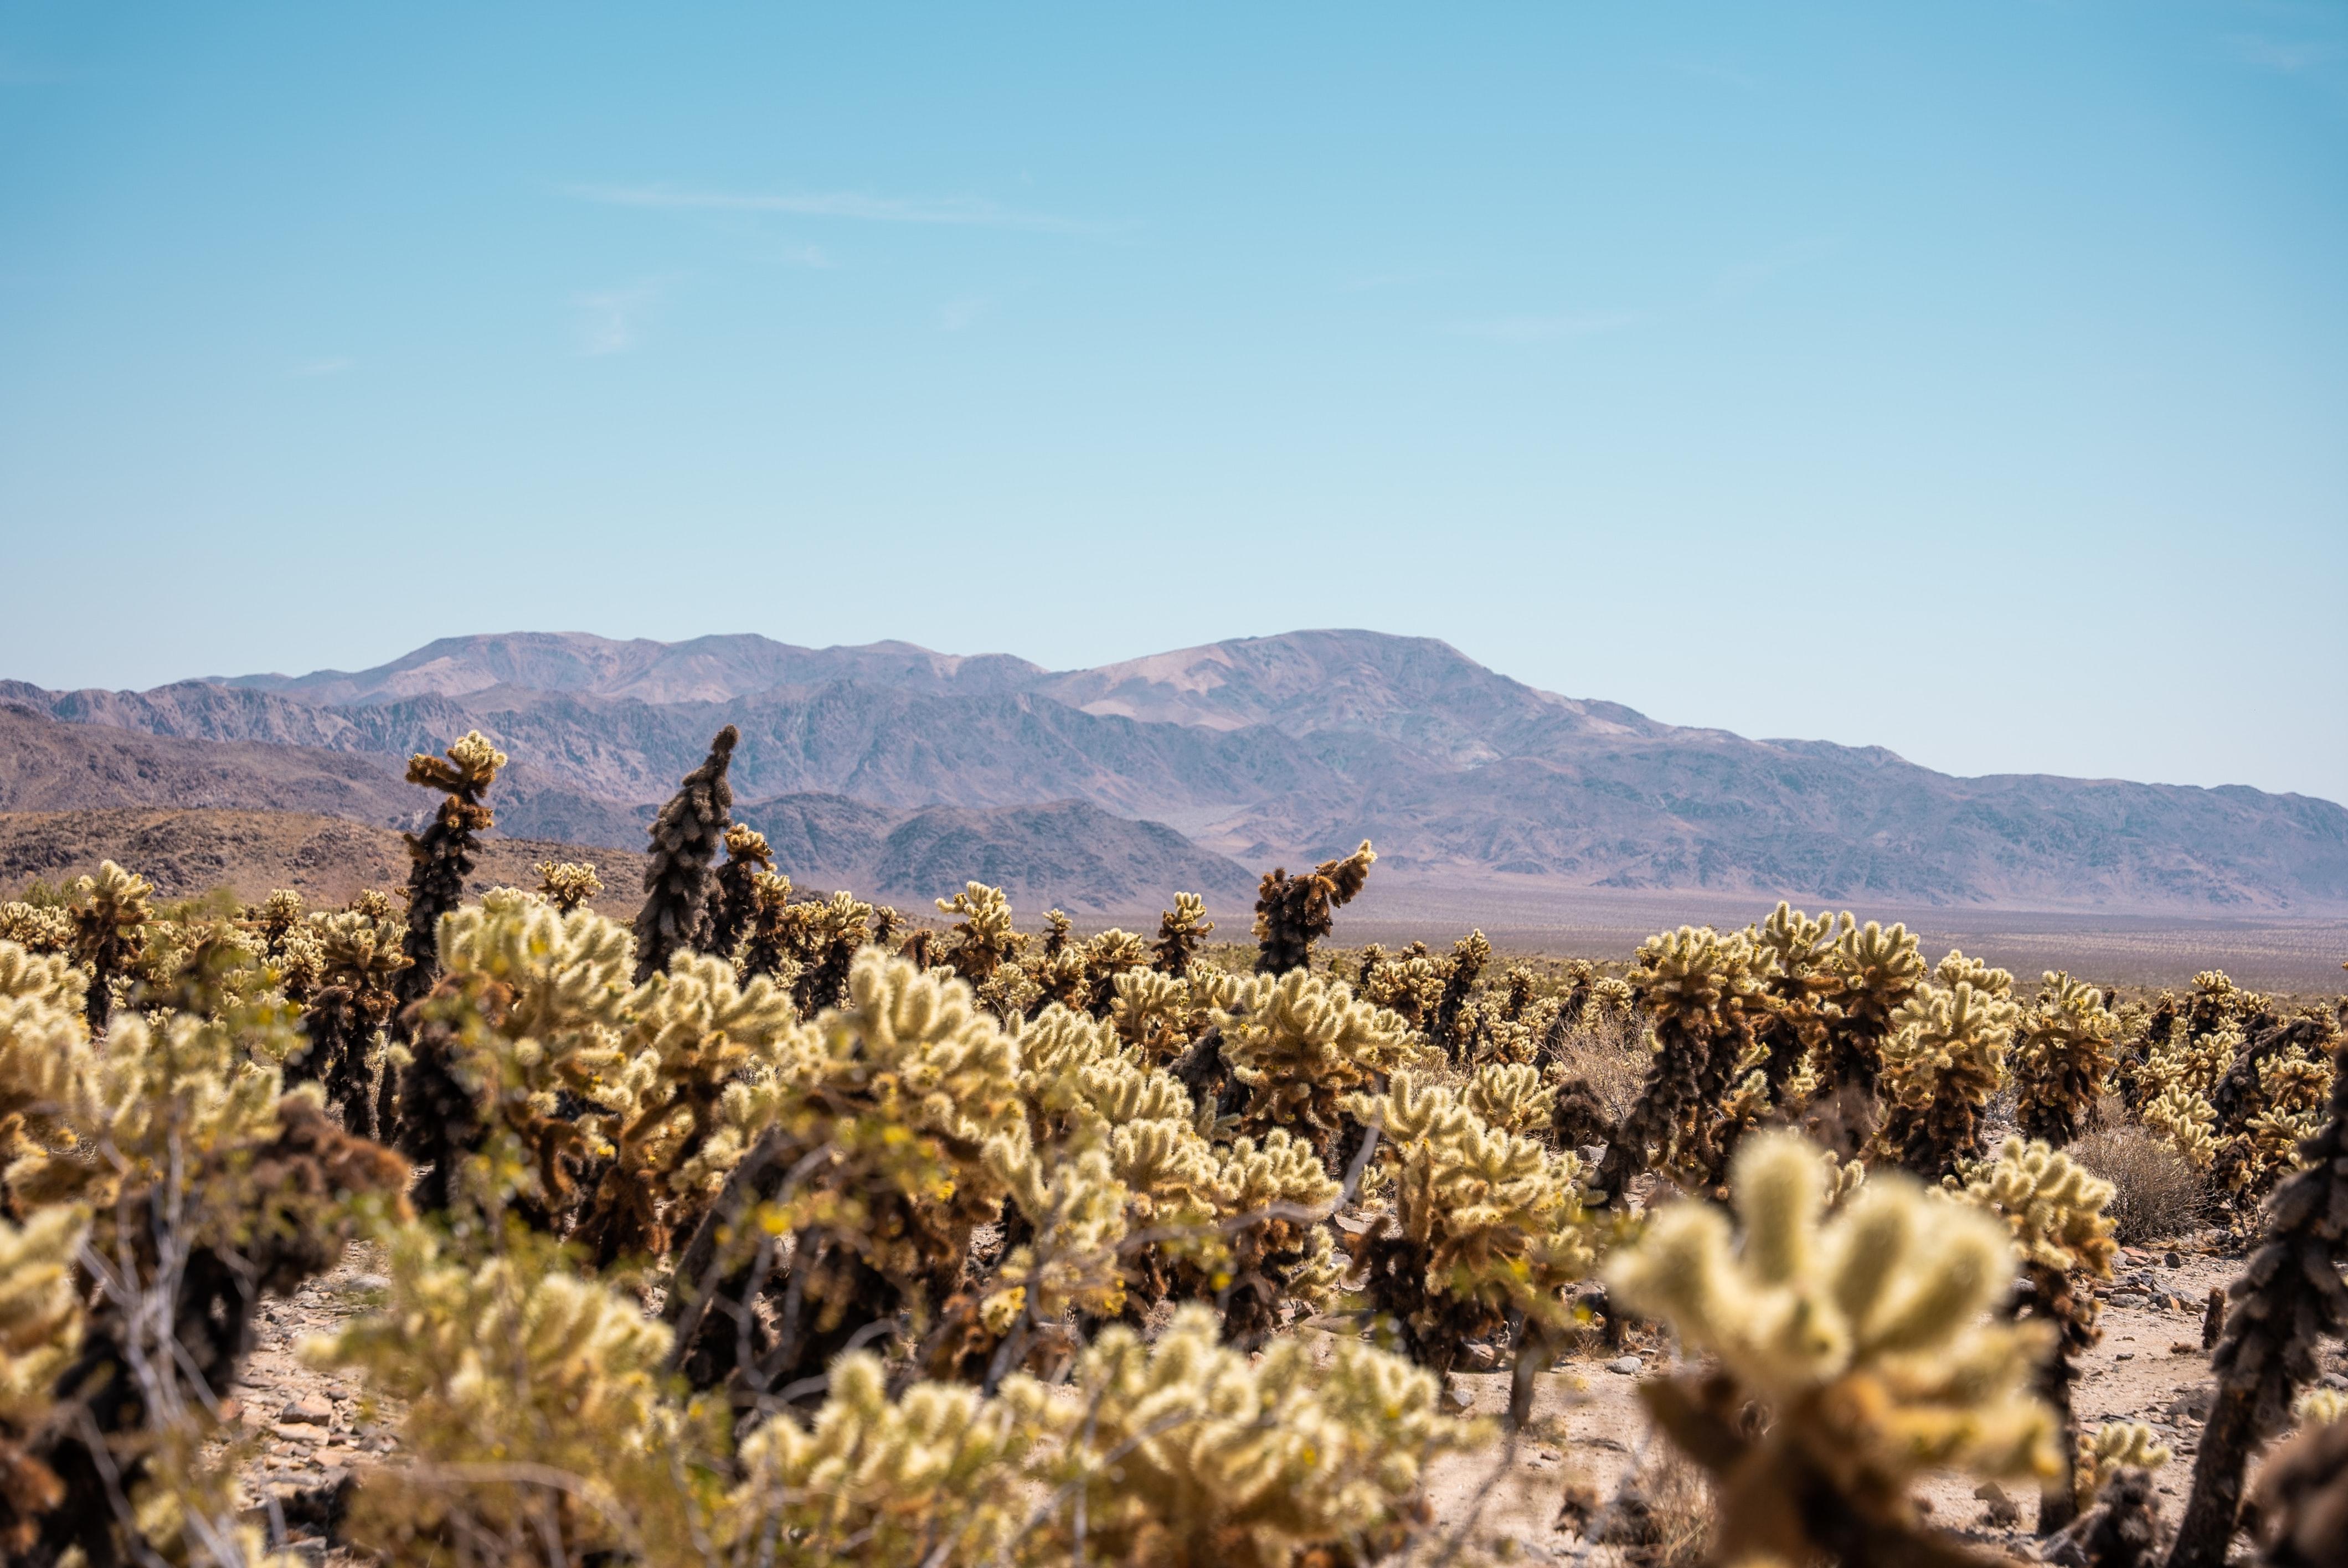 Landscape Nature Desert USA California 4240x2832